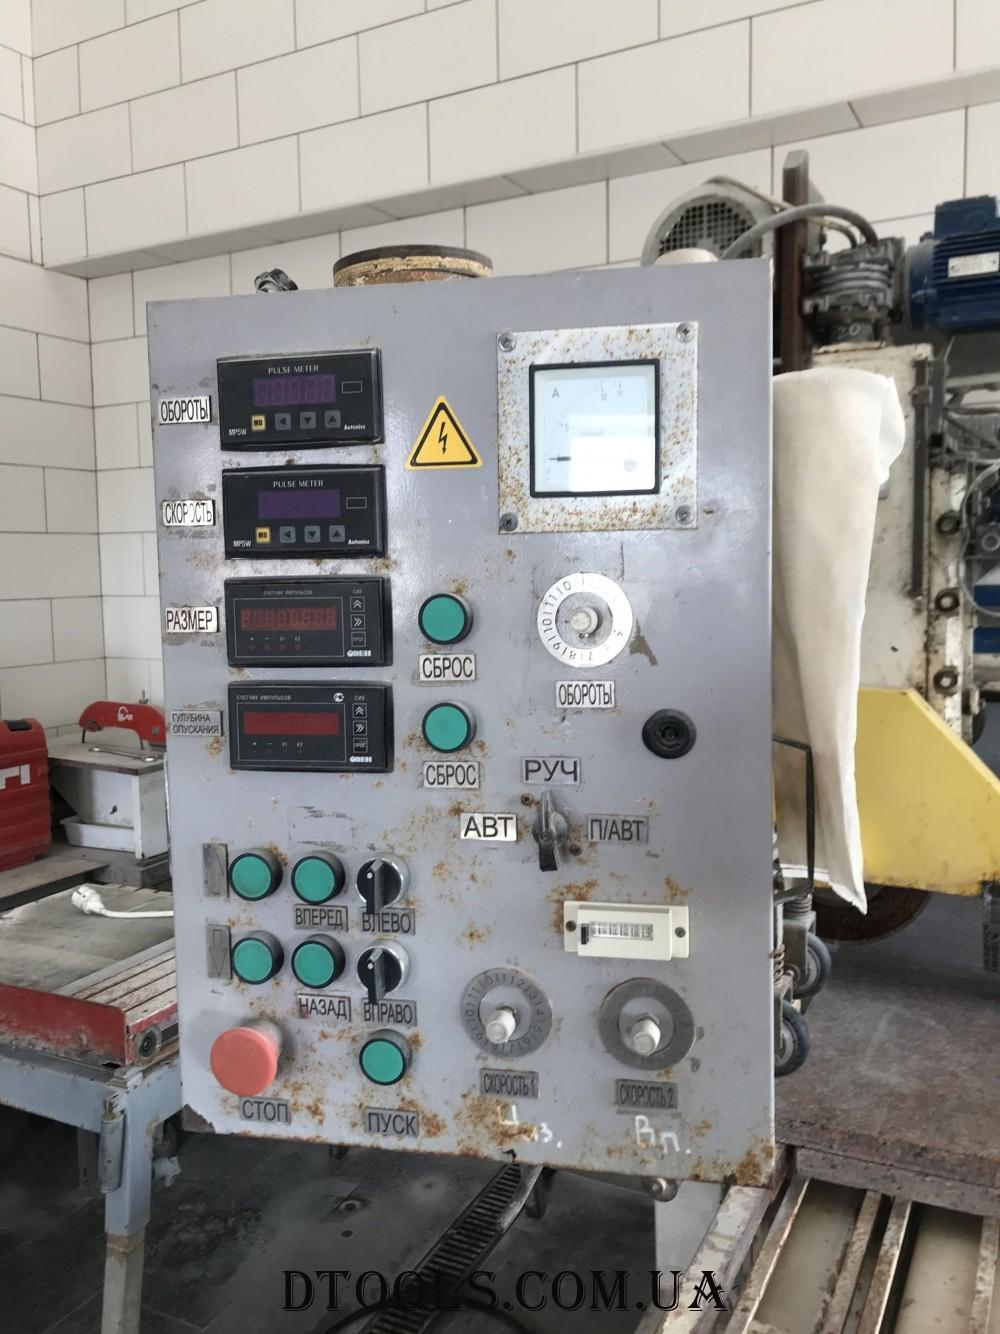 Плиткорез TS-500 Etalon широкоформатный станок - 2